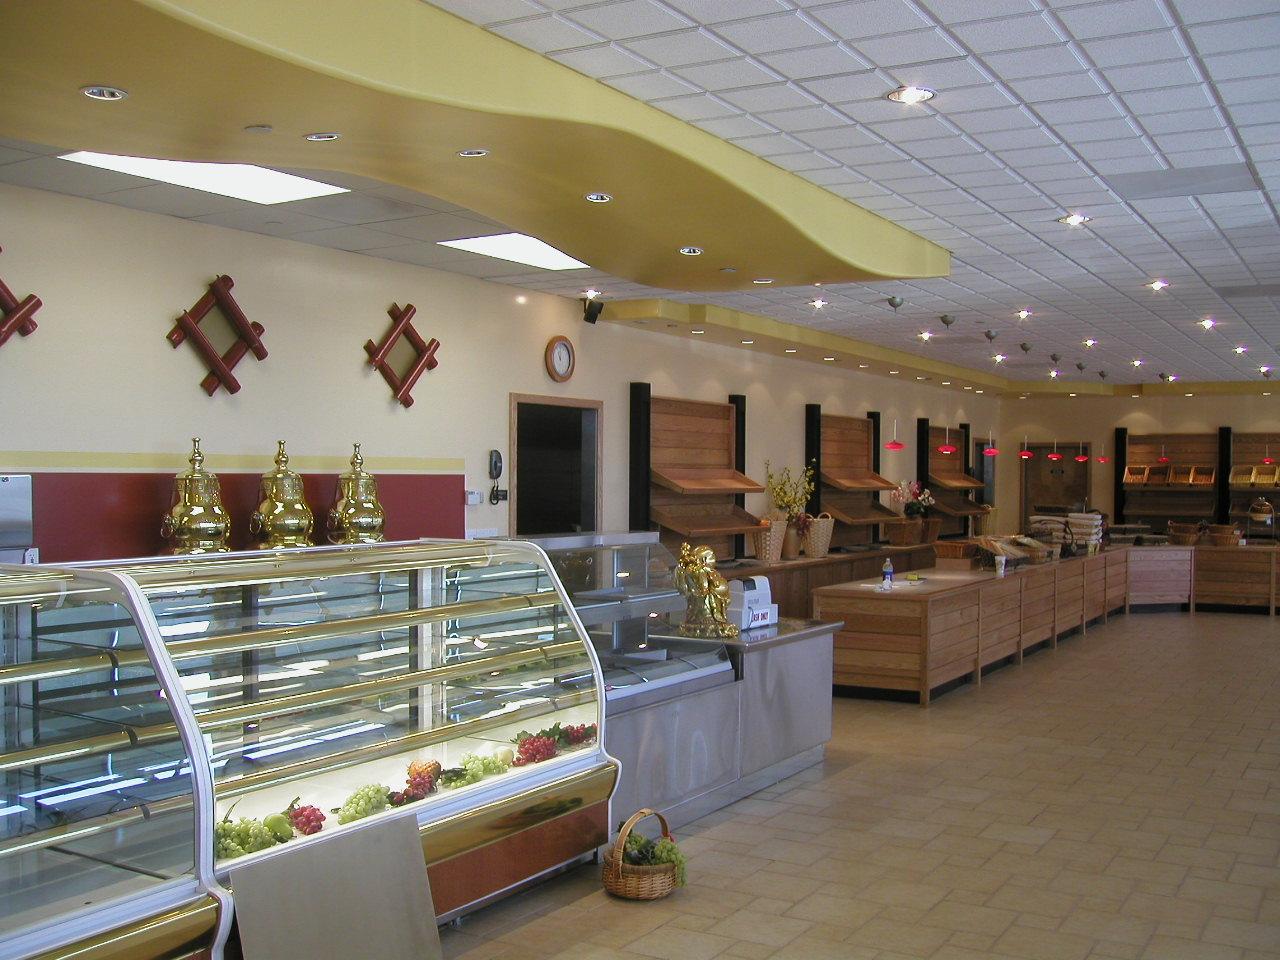 Yuen Yang Bakery